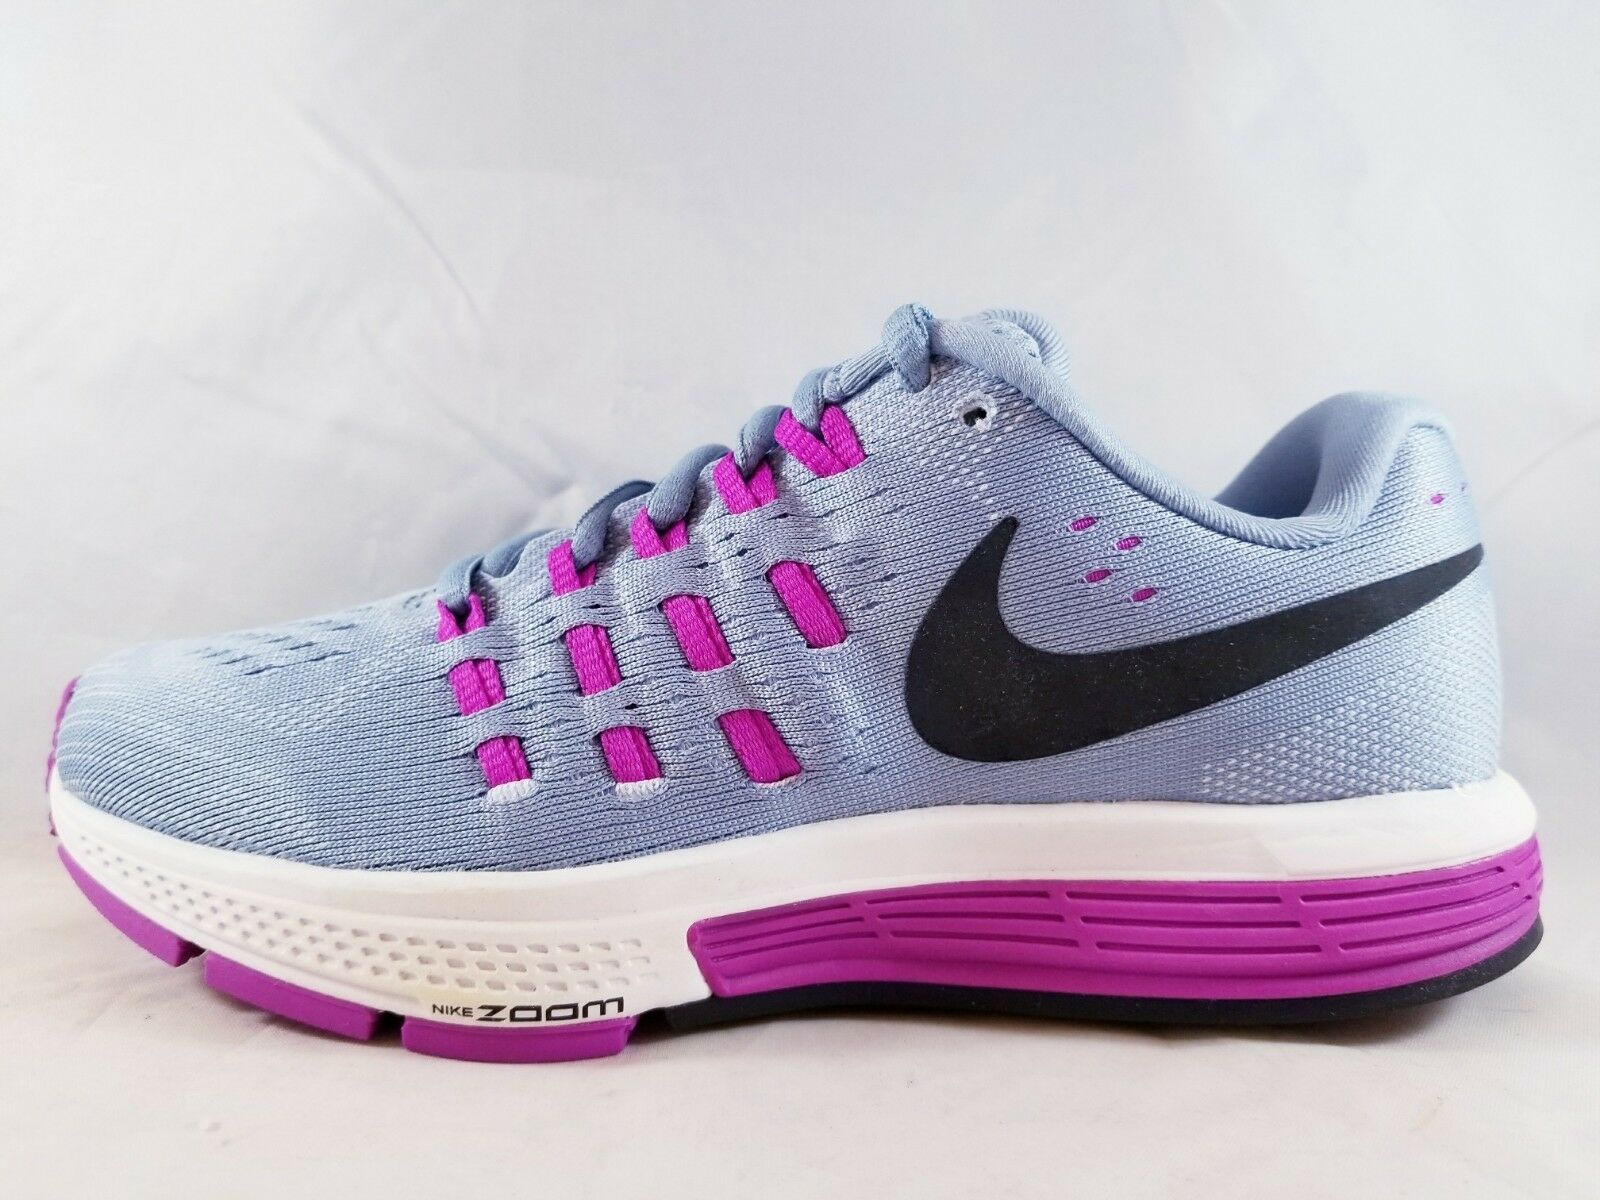 Nike Air Zoom Vomero 11 Women's Running Shoe 818100 405 Size 5